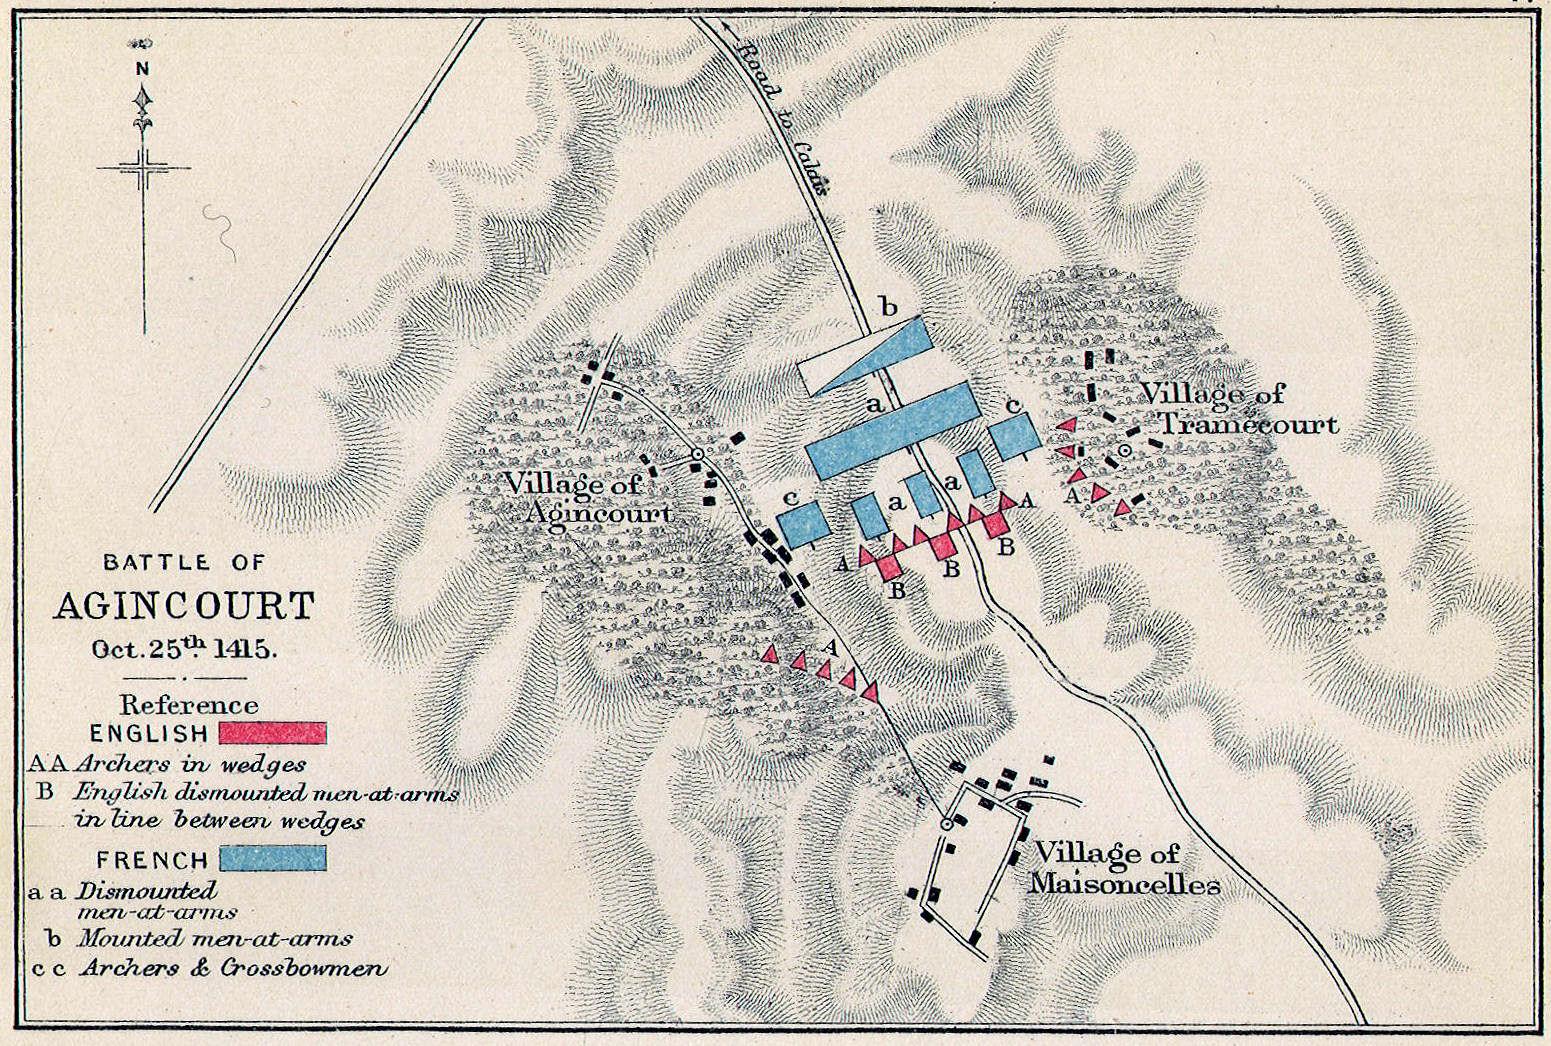 Battle of Agincourt | dr dud's dicta